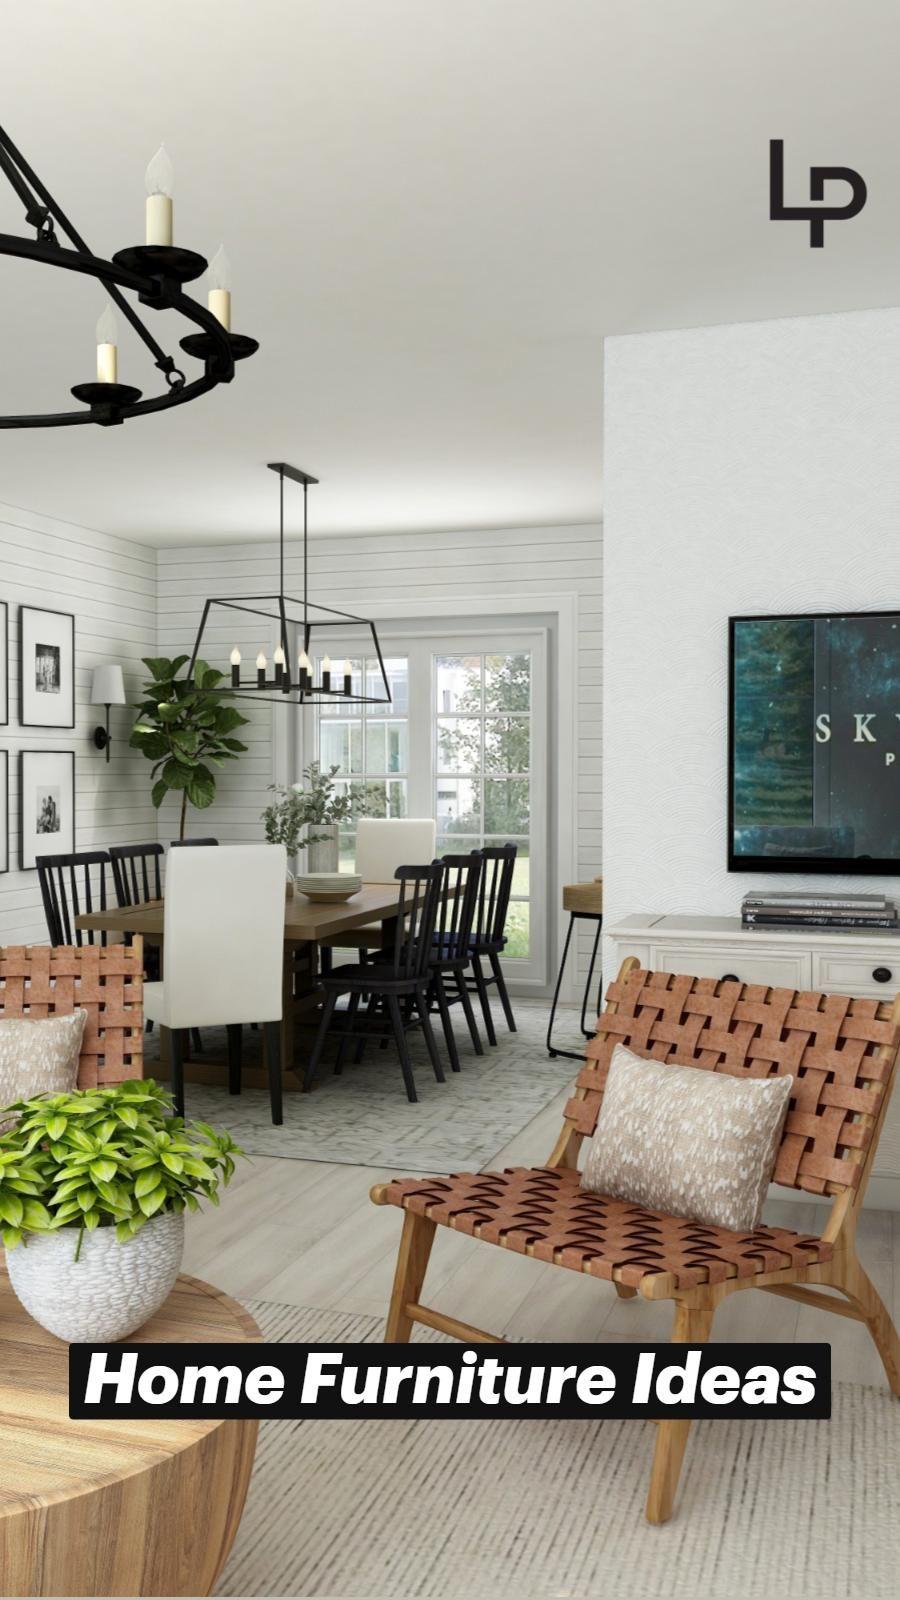 300+ Home Furniture Ideas